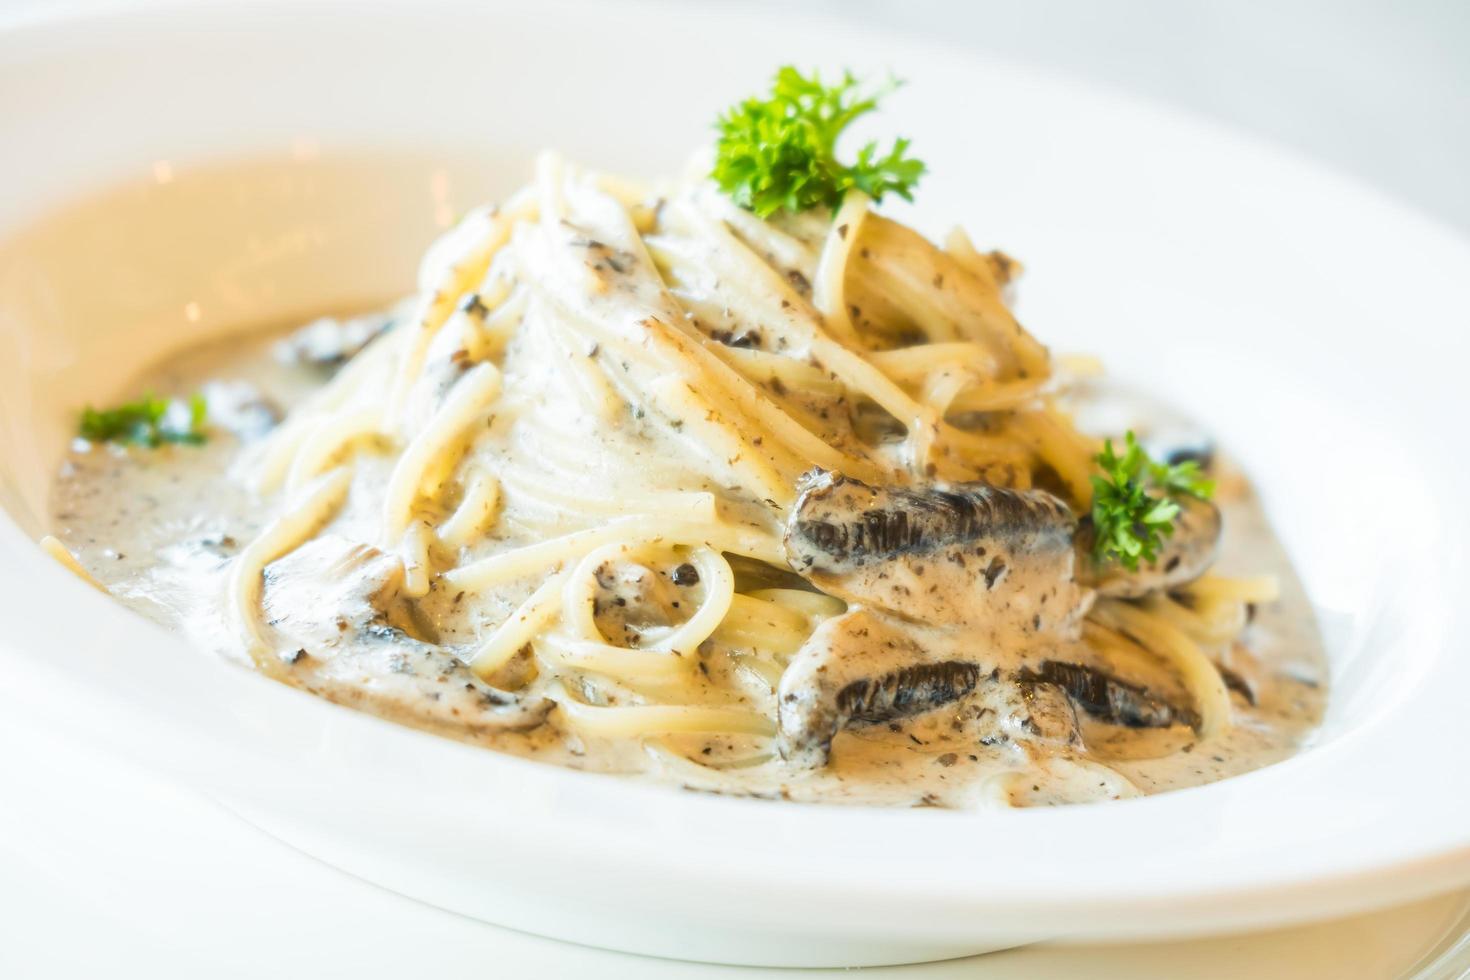 Spaghetti-Sahne-Sauce mit Trüffelpilz foto